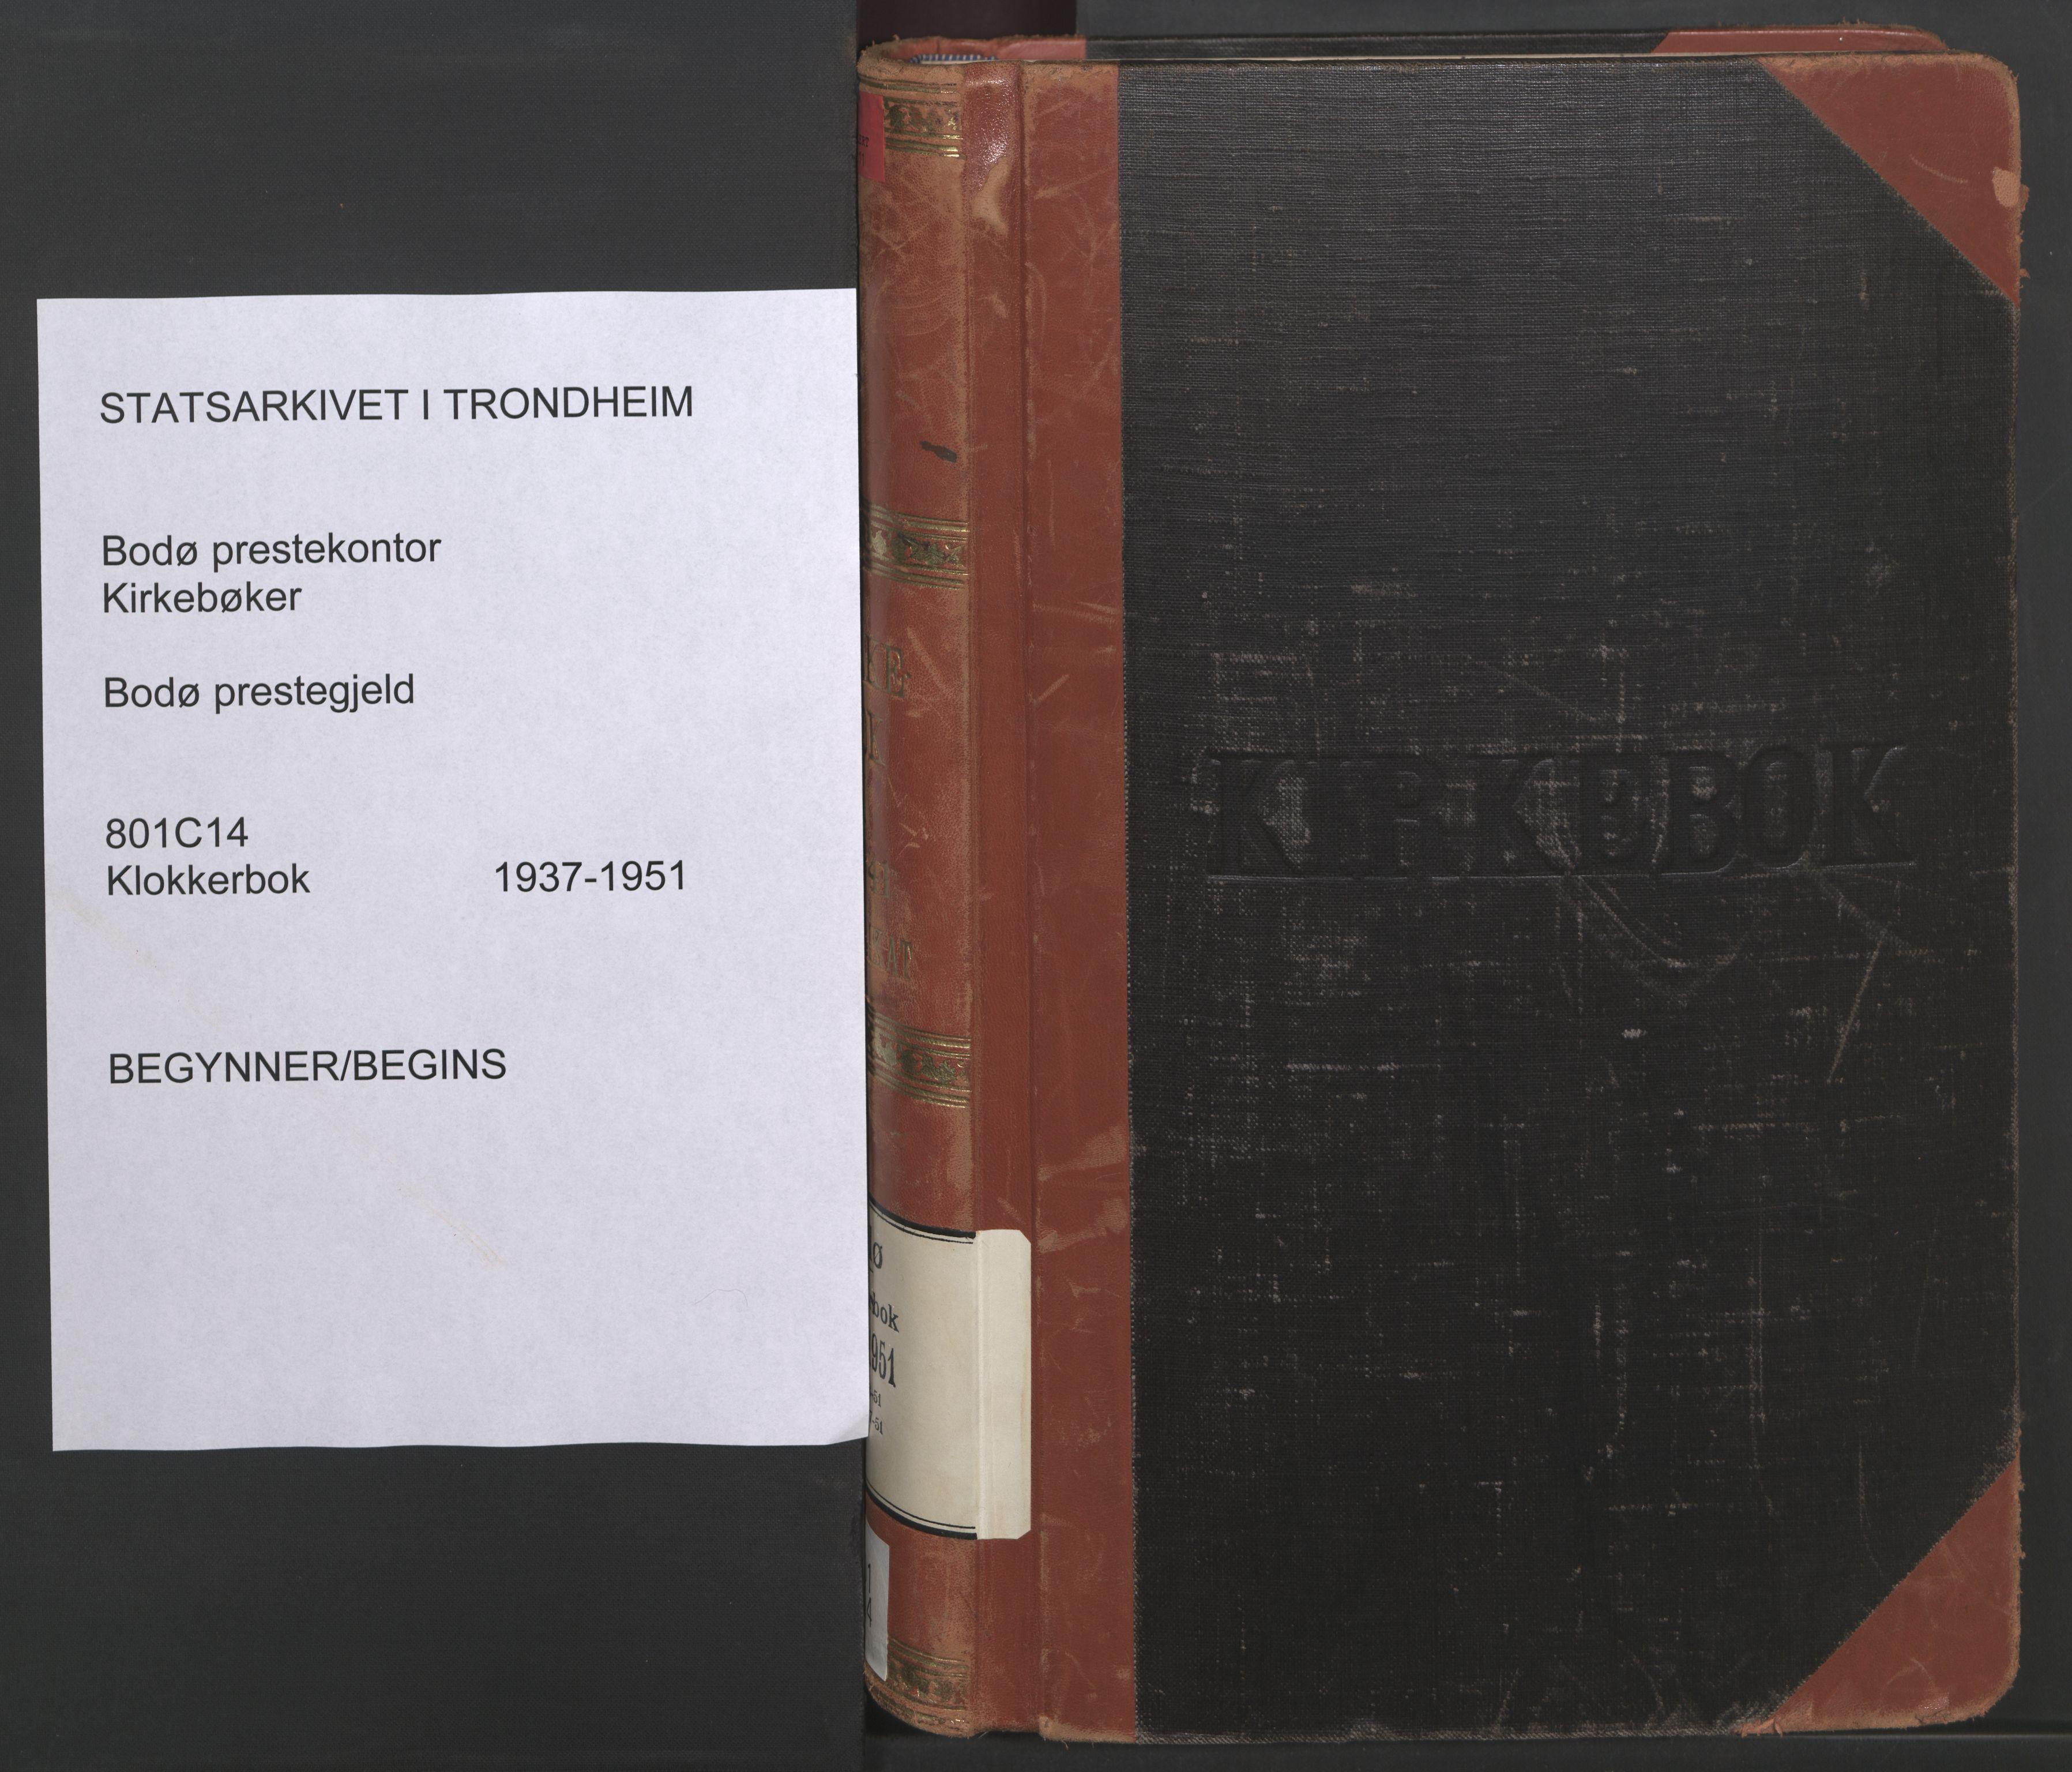 SAT, Ministerialprotokoller, klokkerbøker og fødselsregistre - Nordland, 801/L0039: Klokkerbok nr. 801C14, 1937-1951